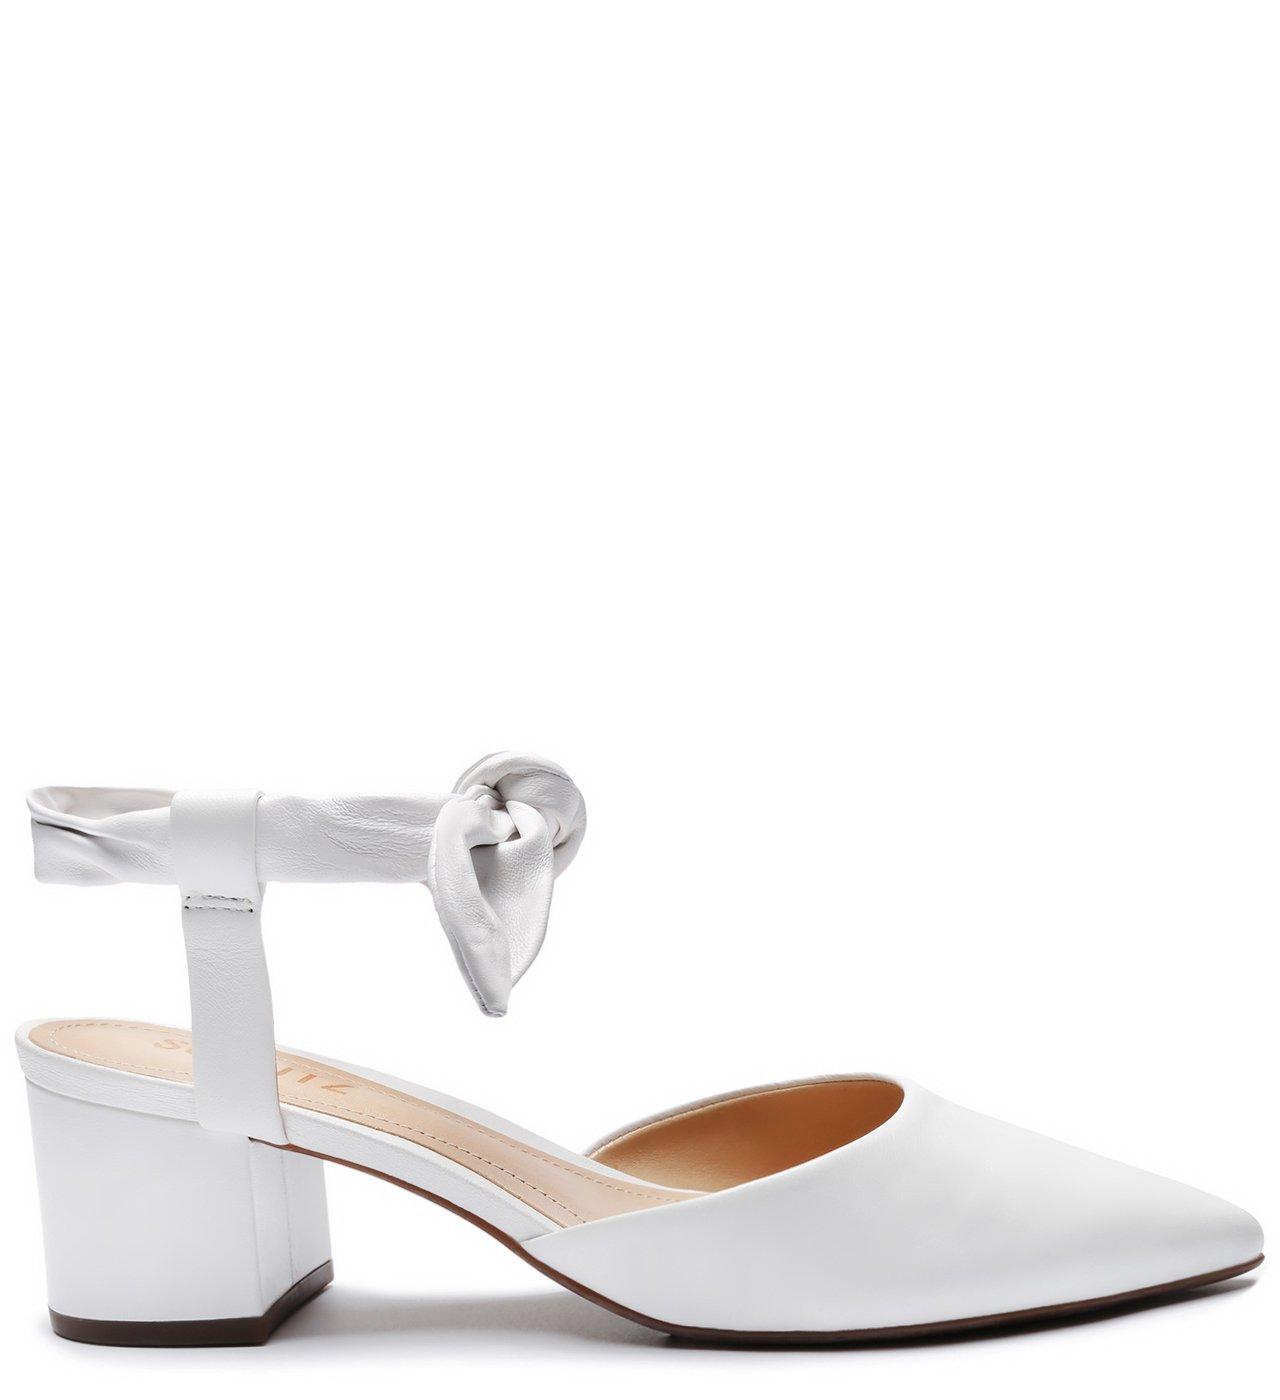 Sapato Bico Fino Block Heel Honey | Schutz